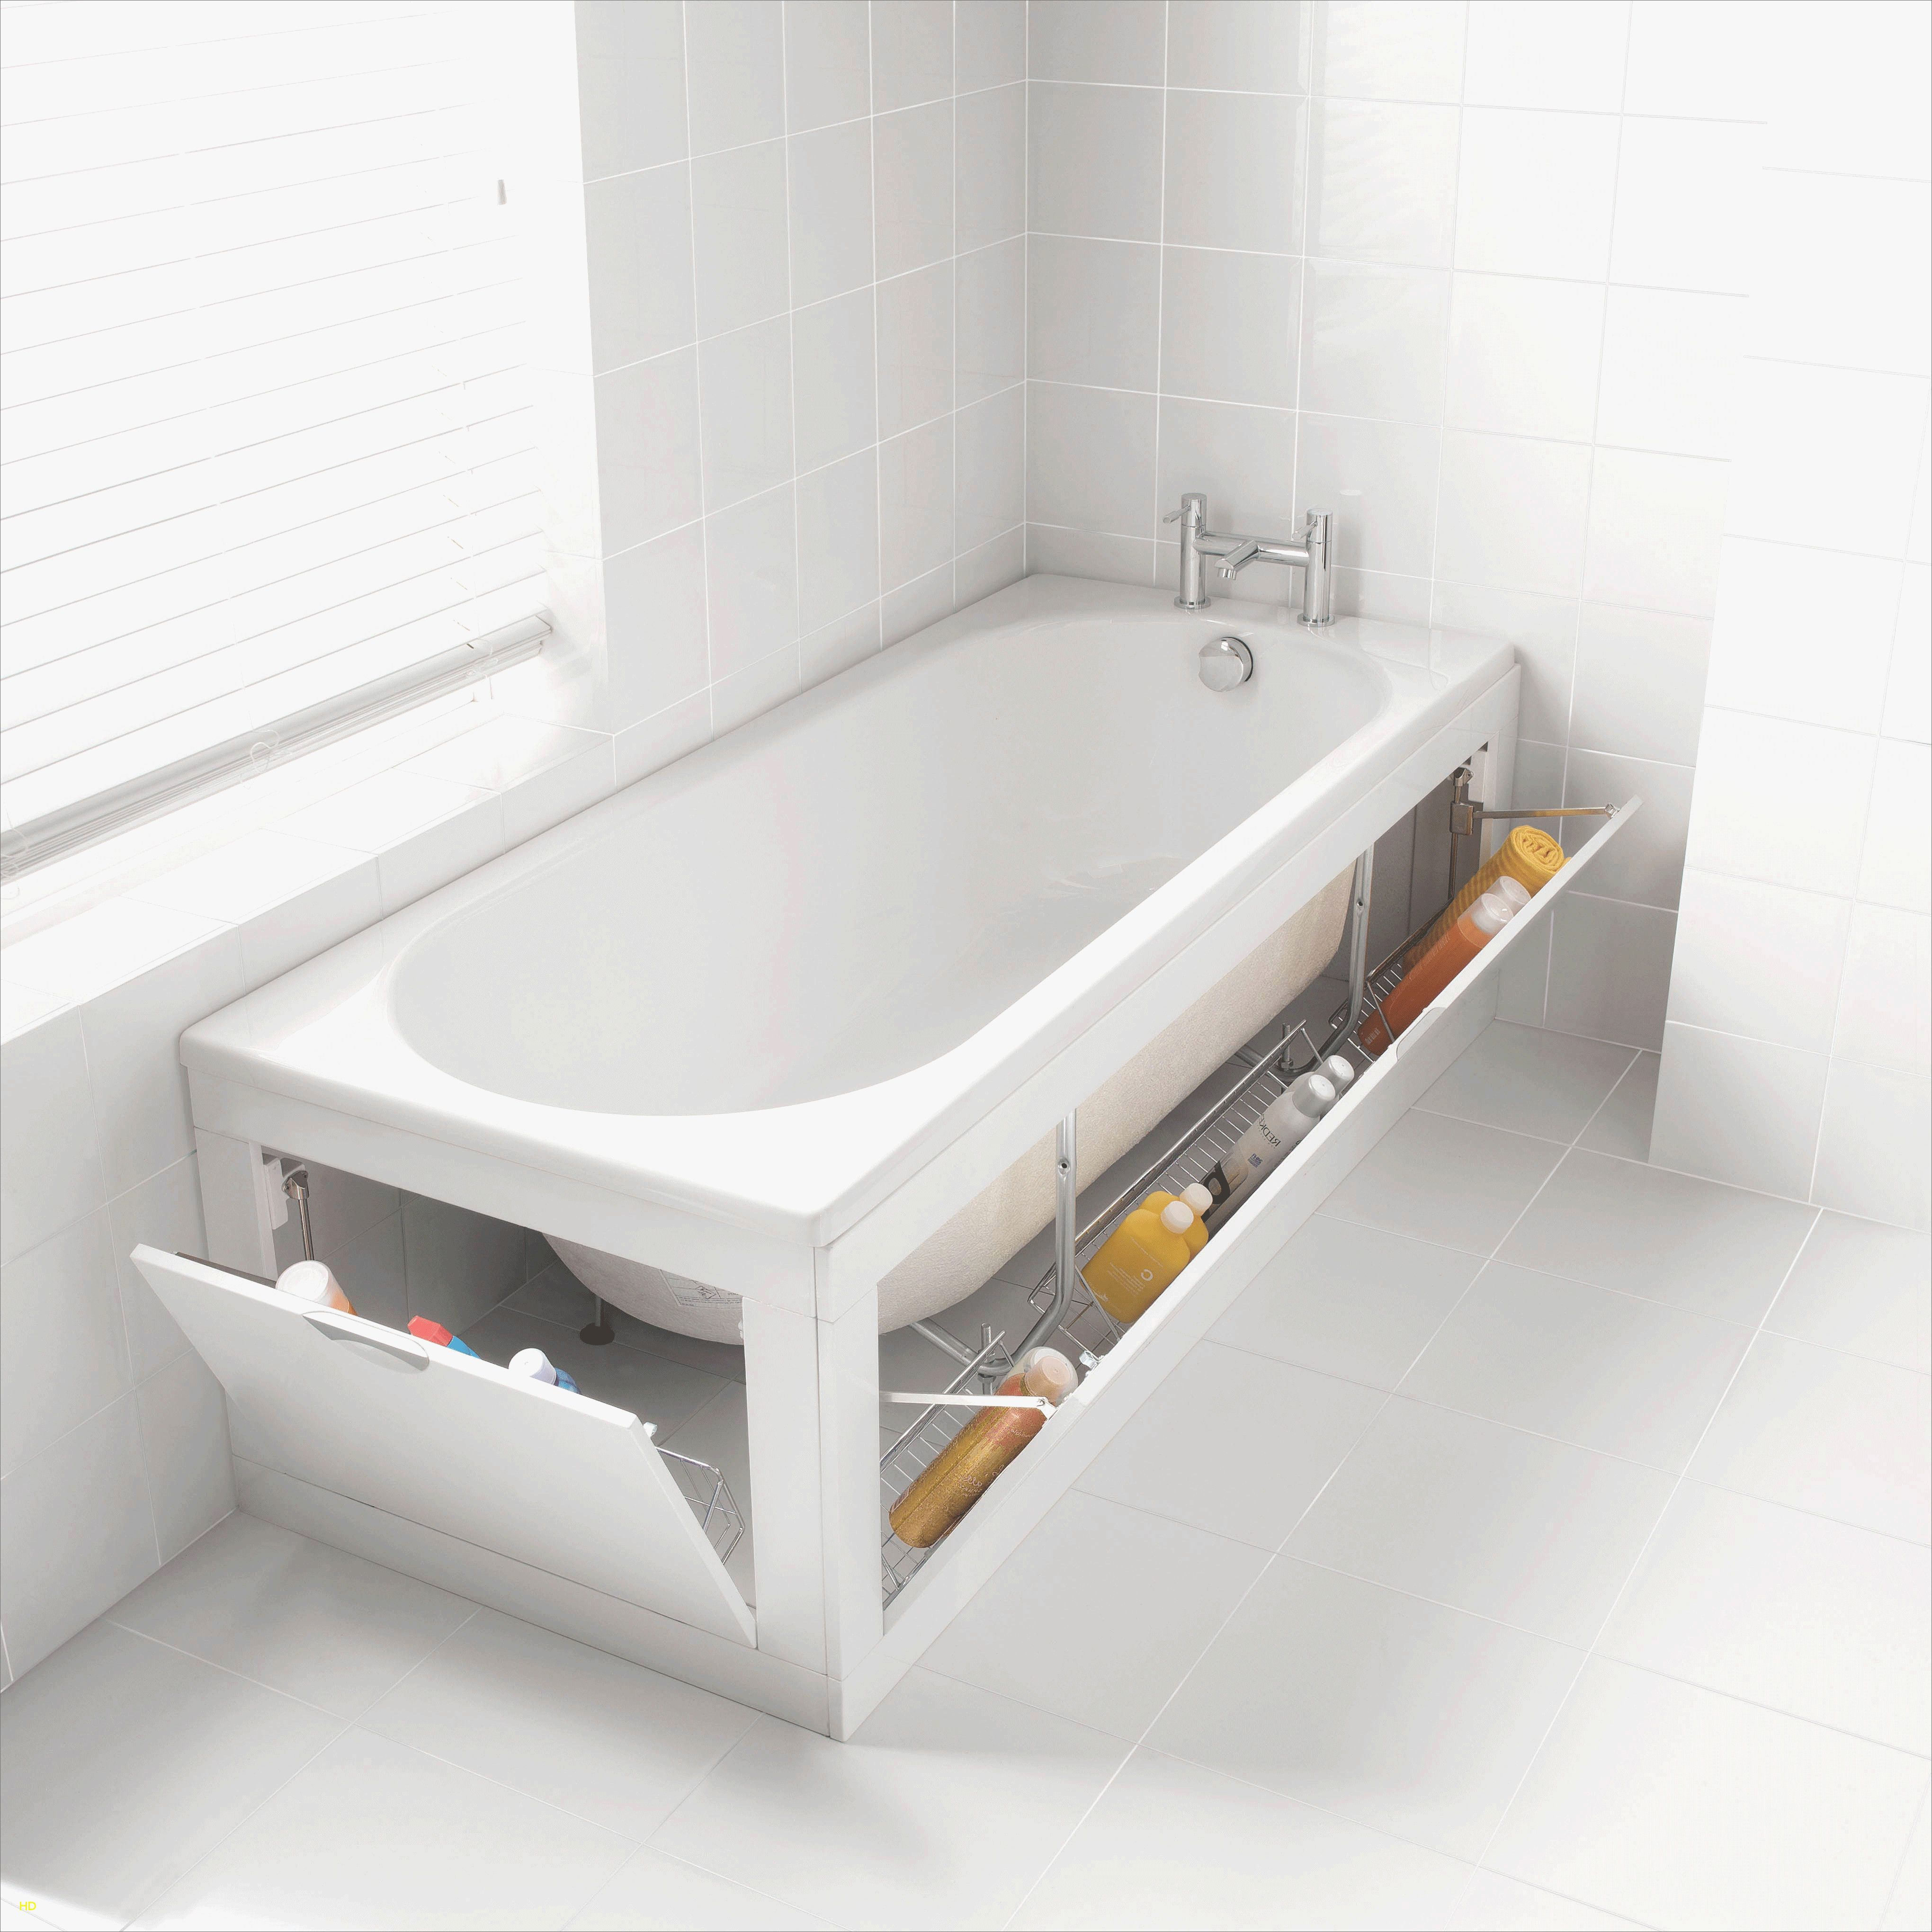 Baignoire Douche Brico Depot Baignoire Douche Brico Depot Cabine De Douche Integrale 70x70 80x80 Diy Bathroom Storage Diy Bathroom Design Bathroom Furniture